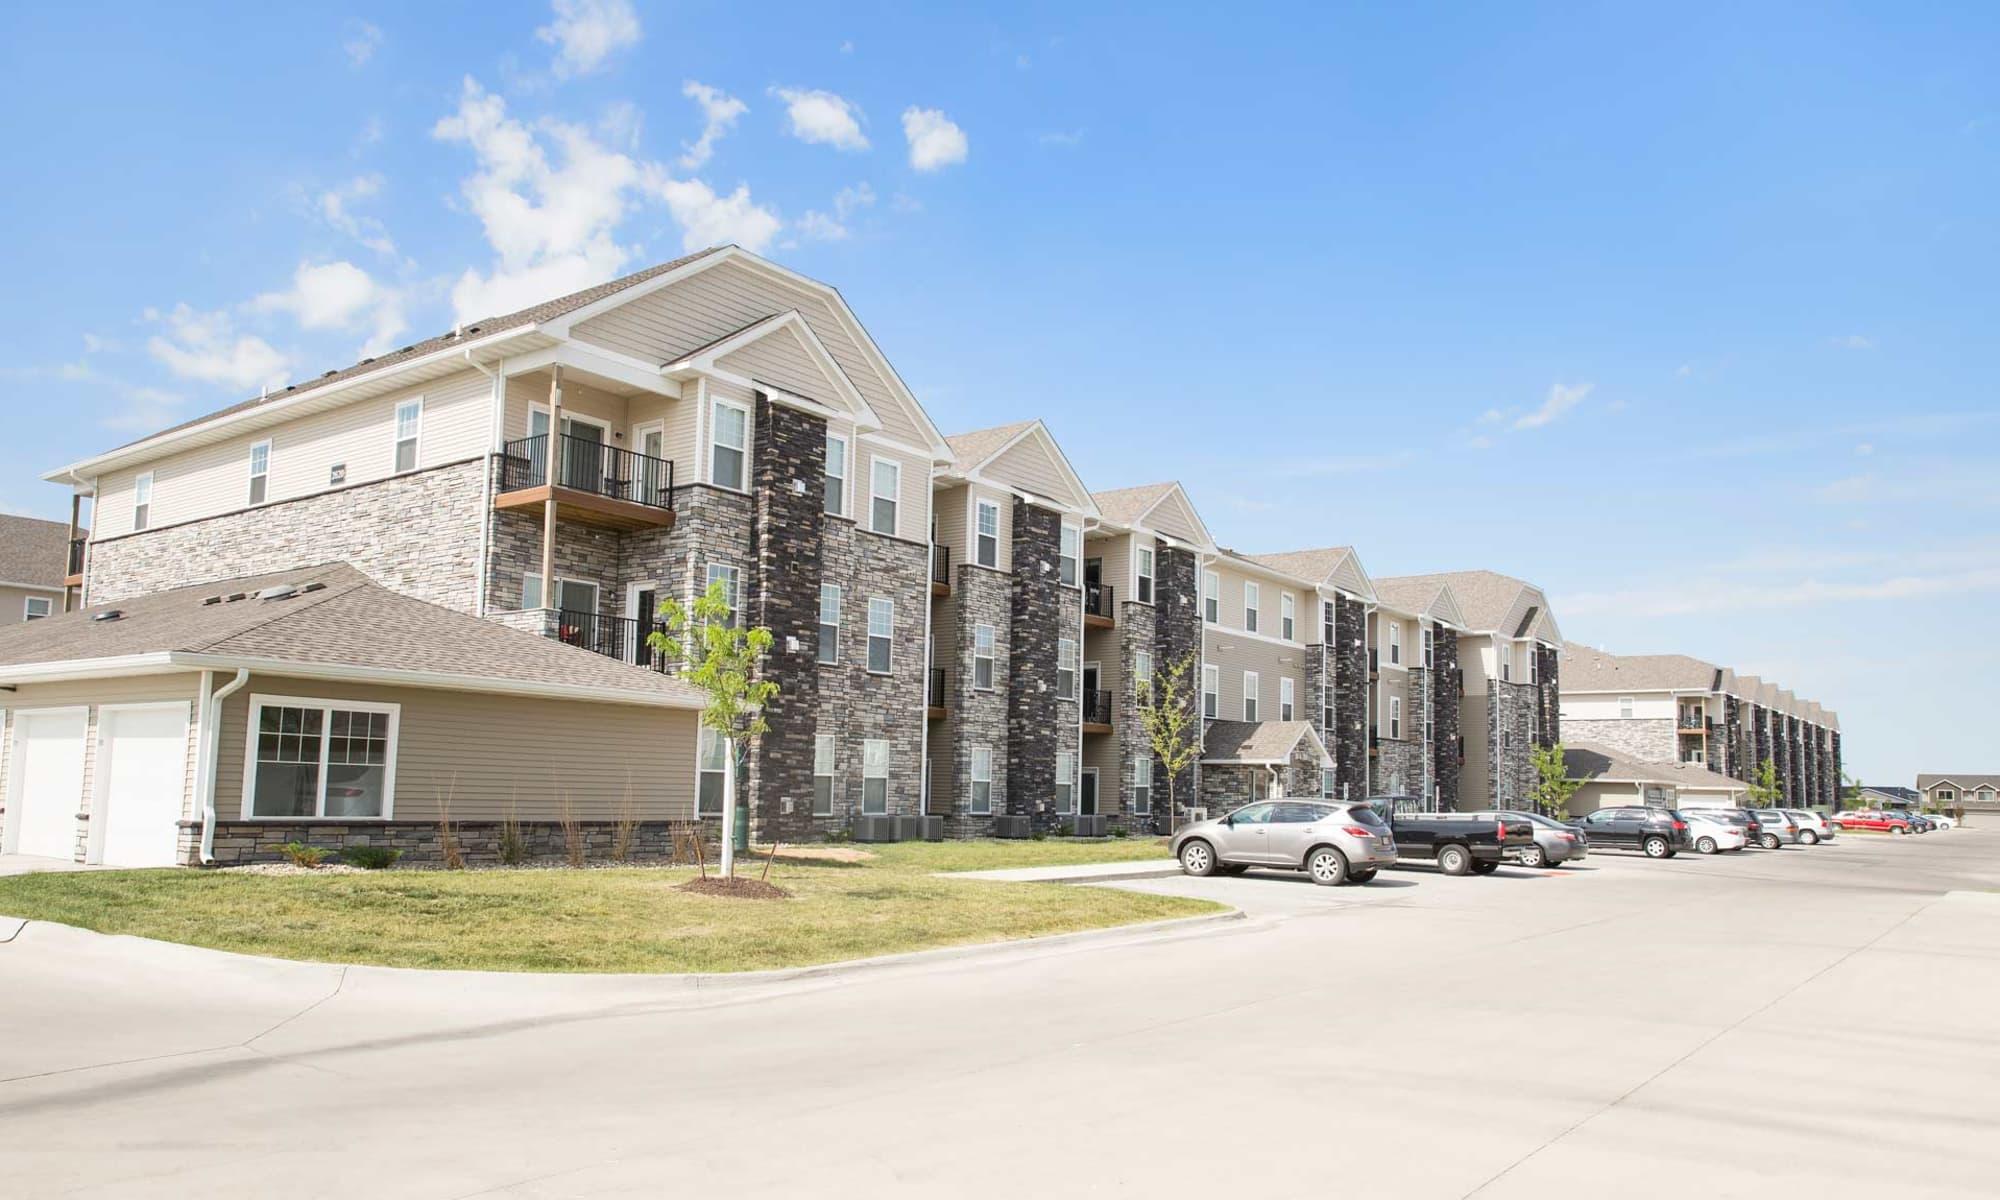 Apartments in Altoona, Iowa